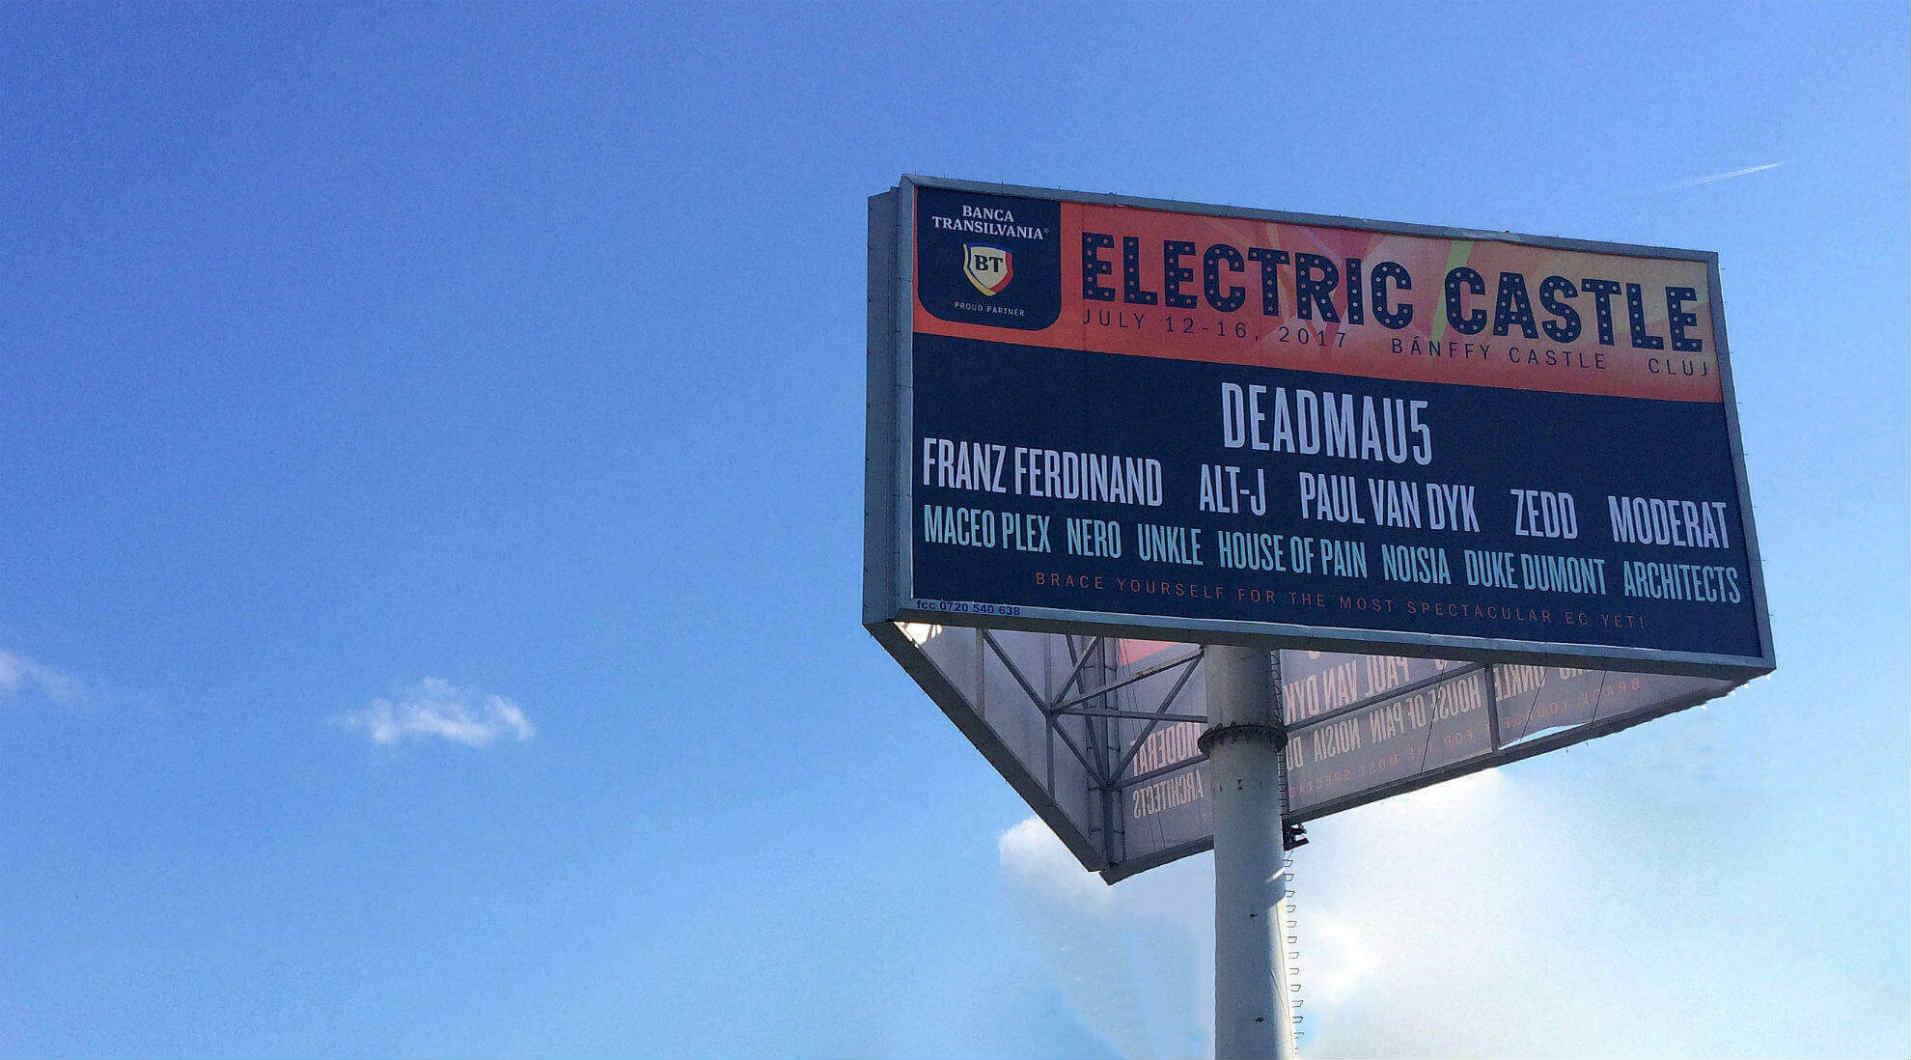 Electric Castle, Pma Invest, Pablo Sign, print outdoor